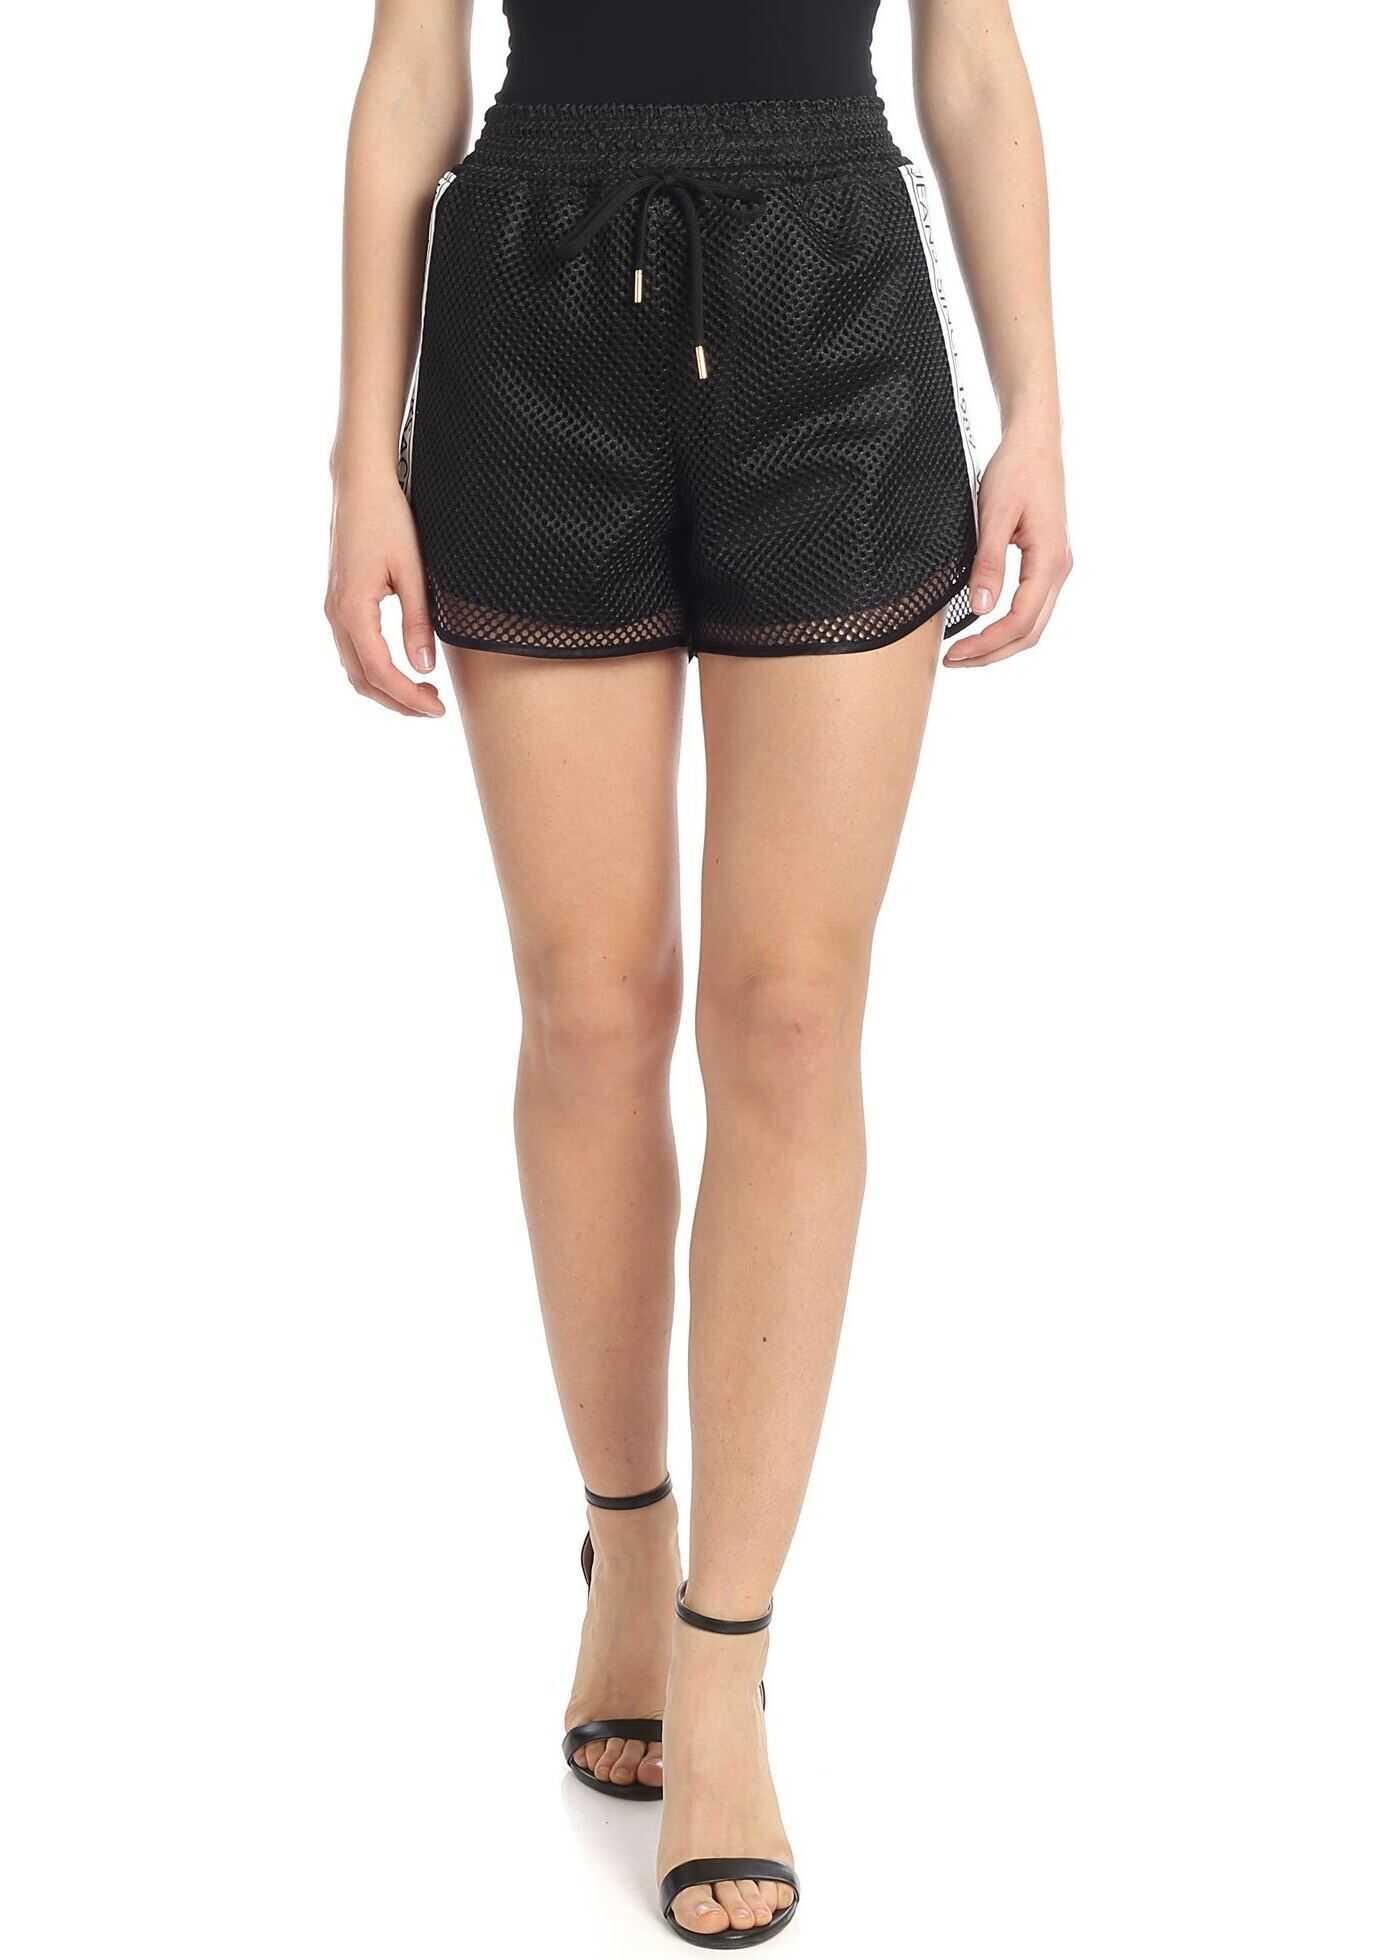 Versace Jeans Black Mesh Fabric Shorts Black